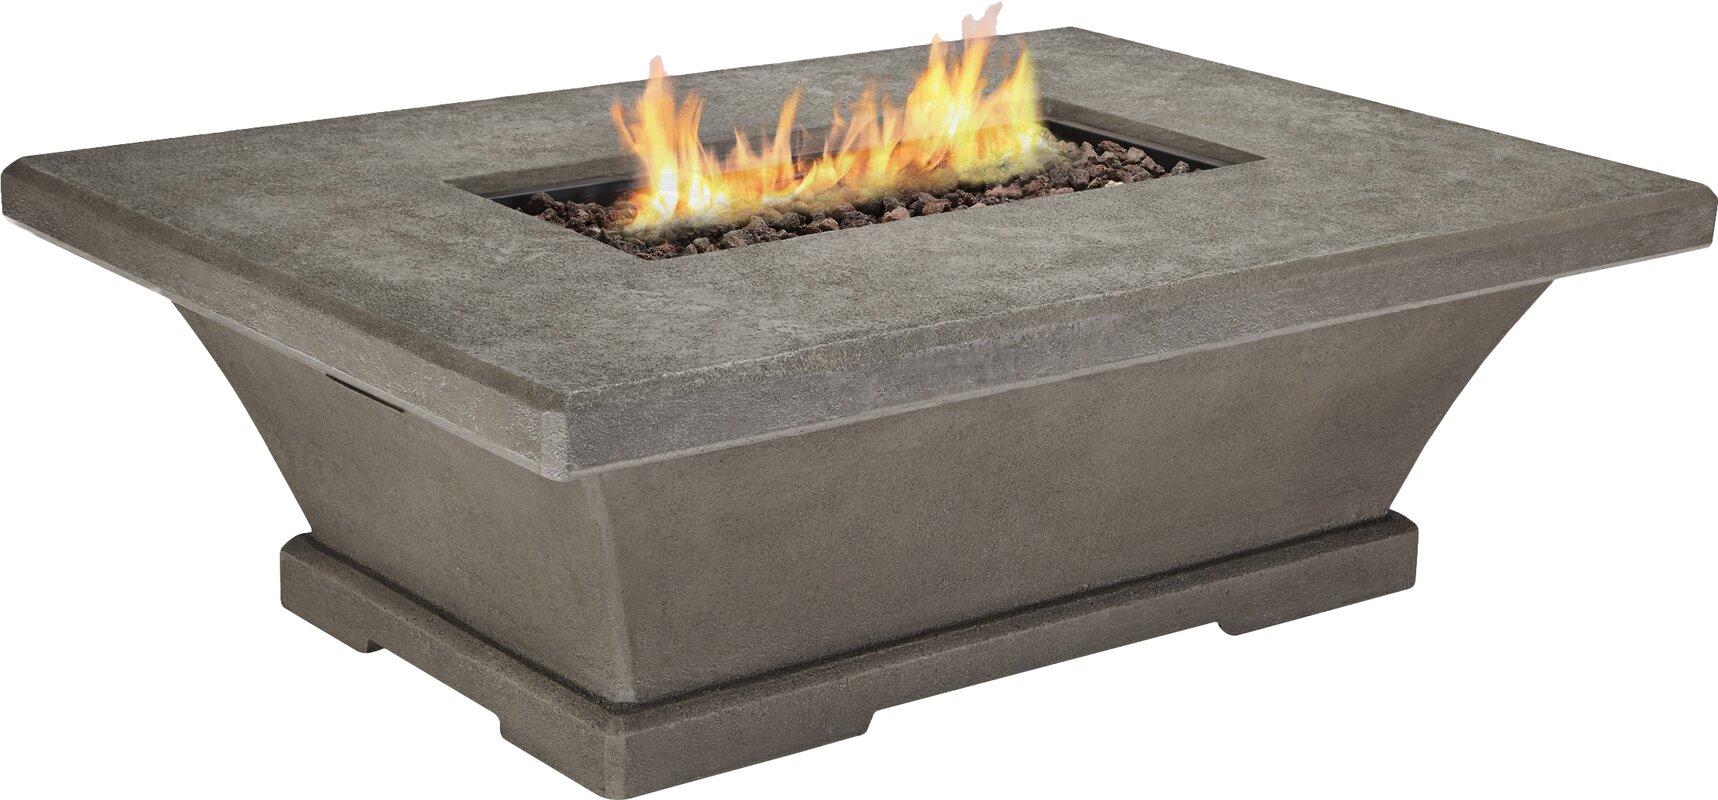 real flame monaco concrete propane fire pit table reviews. Black Bedroom Furniture Sets. Home Design Ideas